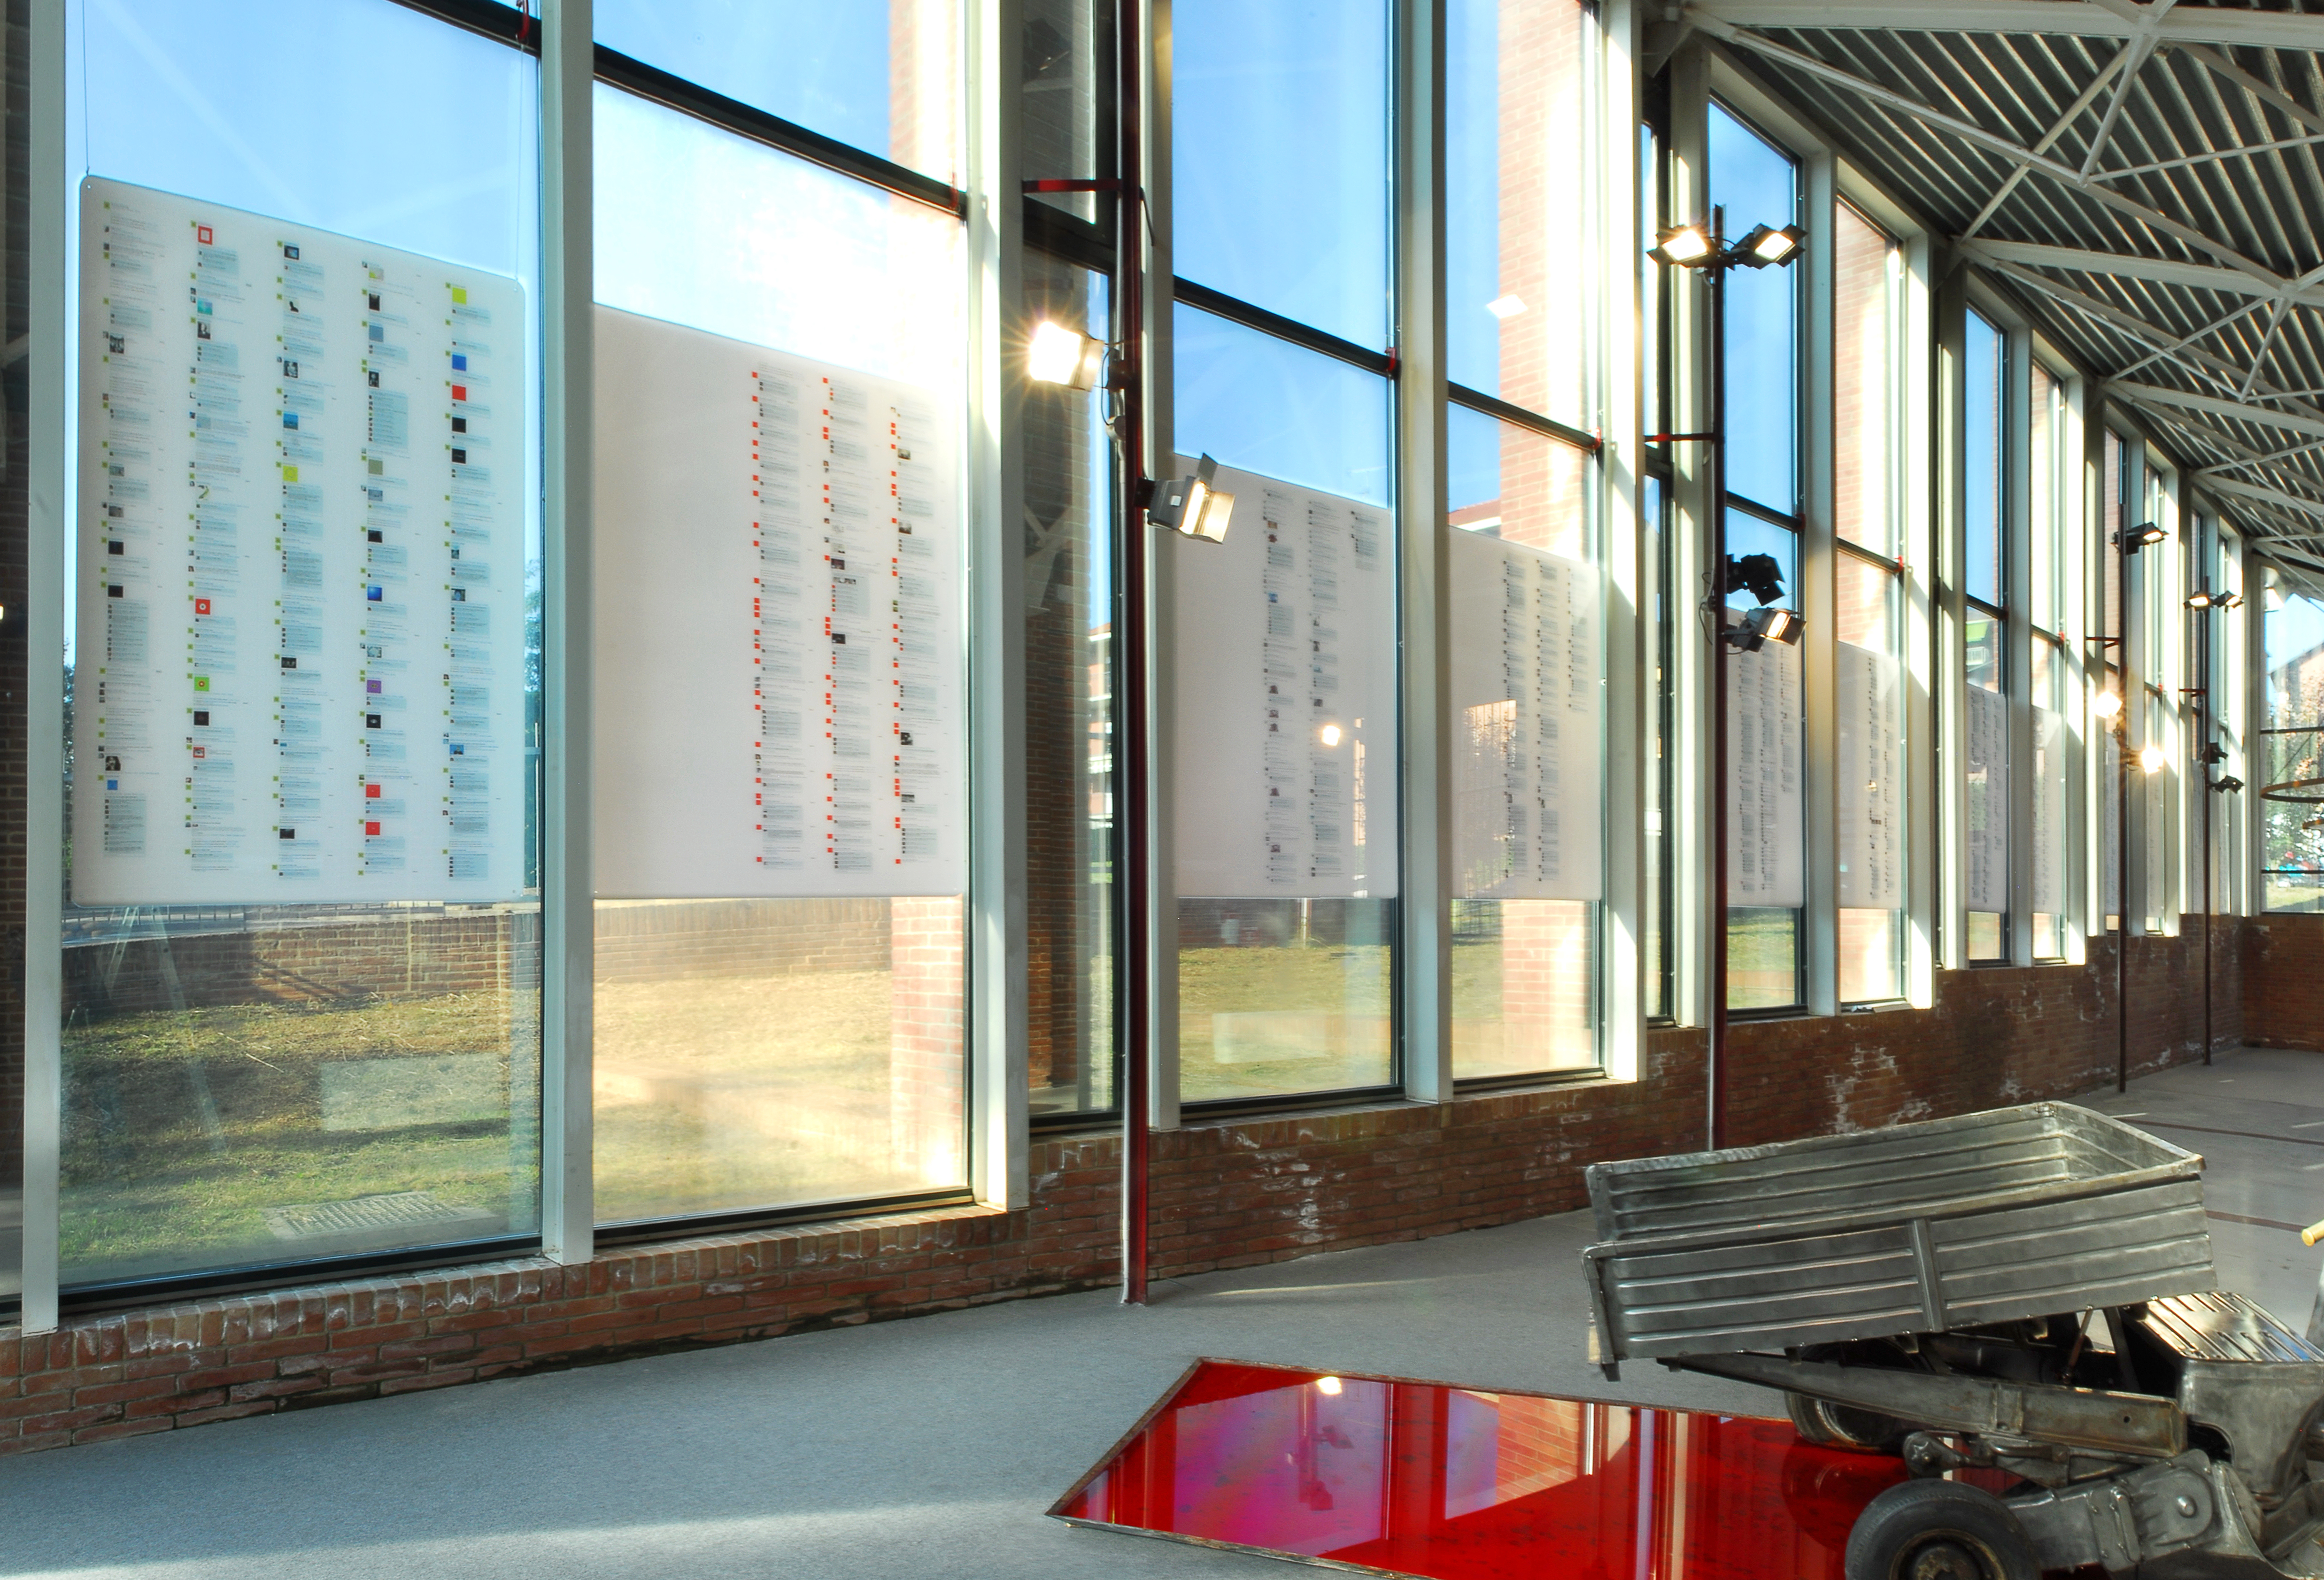 ALESSANDRO BULGINI Vivo 2008-09 Stampa ink-jet su plexiglass 12 elementi 186x124cm caduno